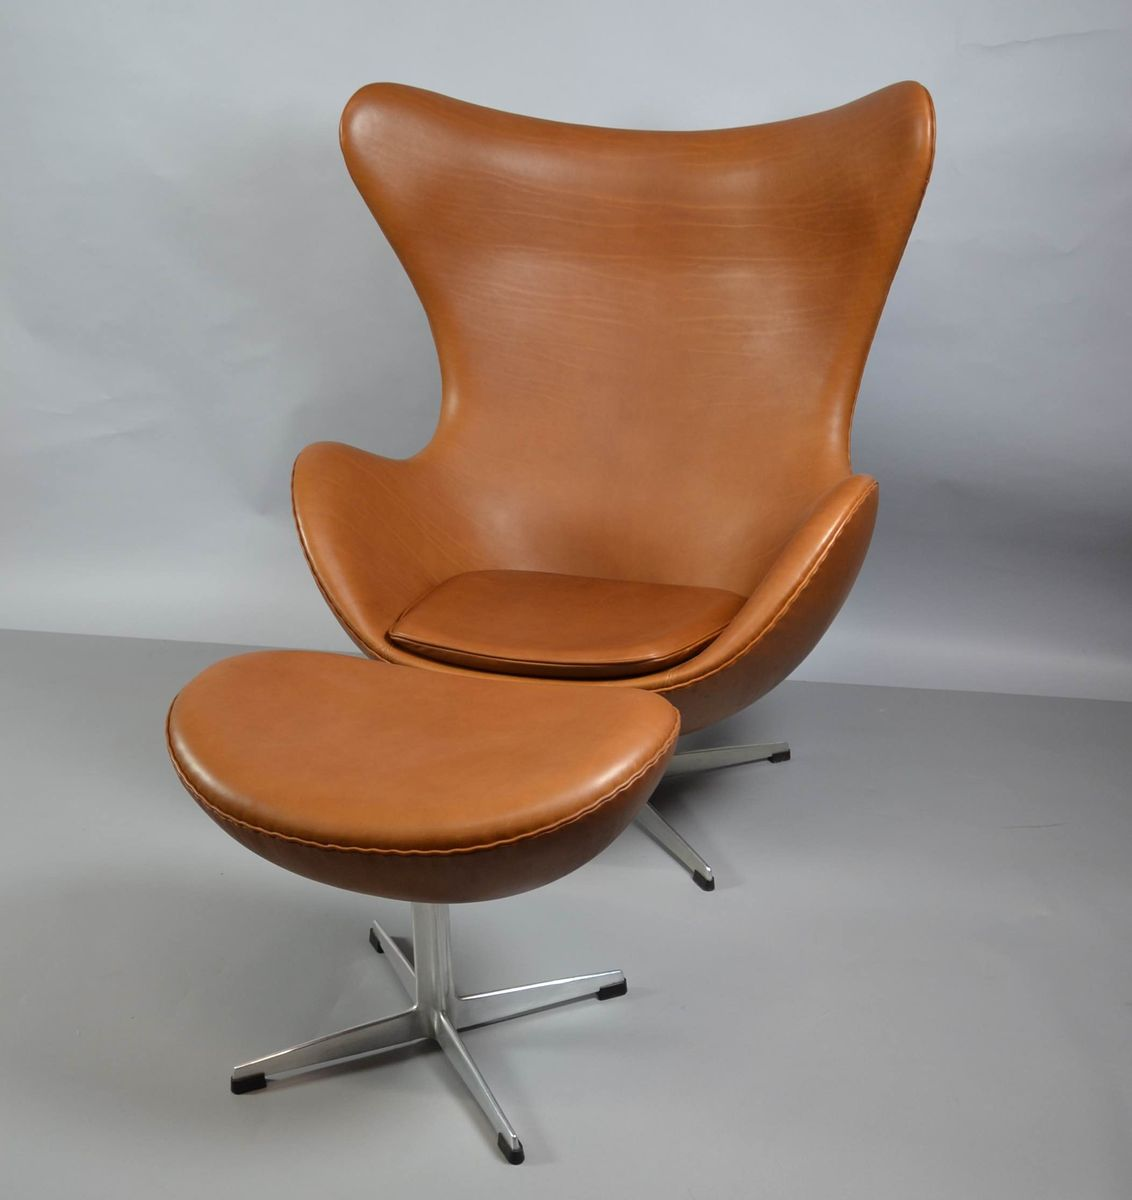 egg chair aus leder mit ottomane von arne jacobsen f r. Black Bedroom Furniture Sets. Home Design Ideas